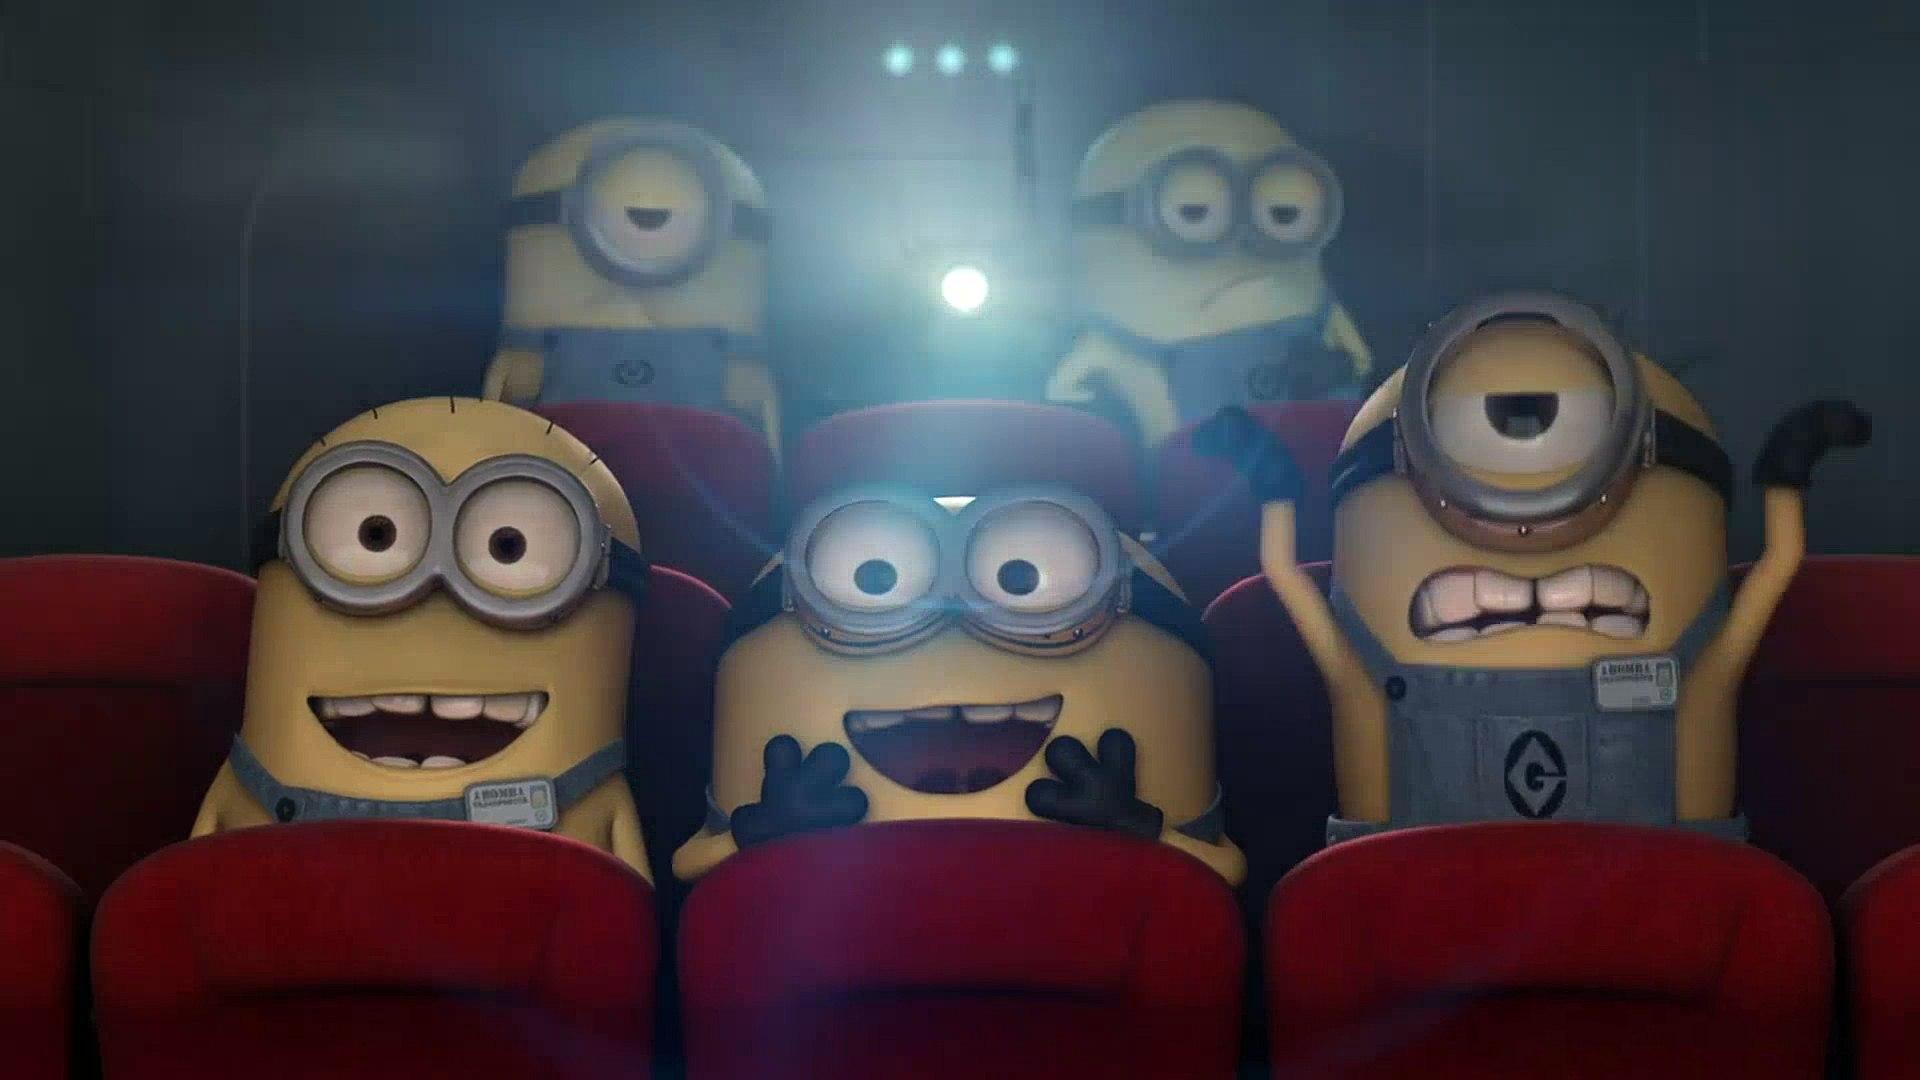 minions full movie download 480p